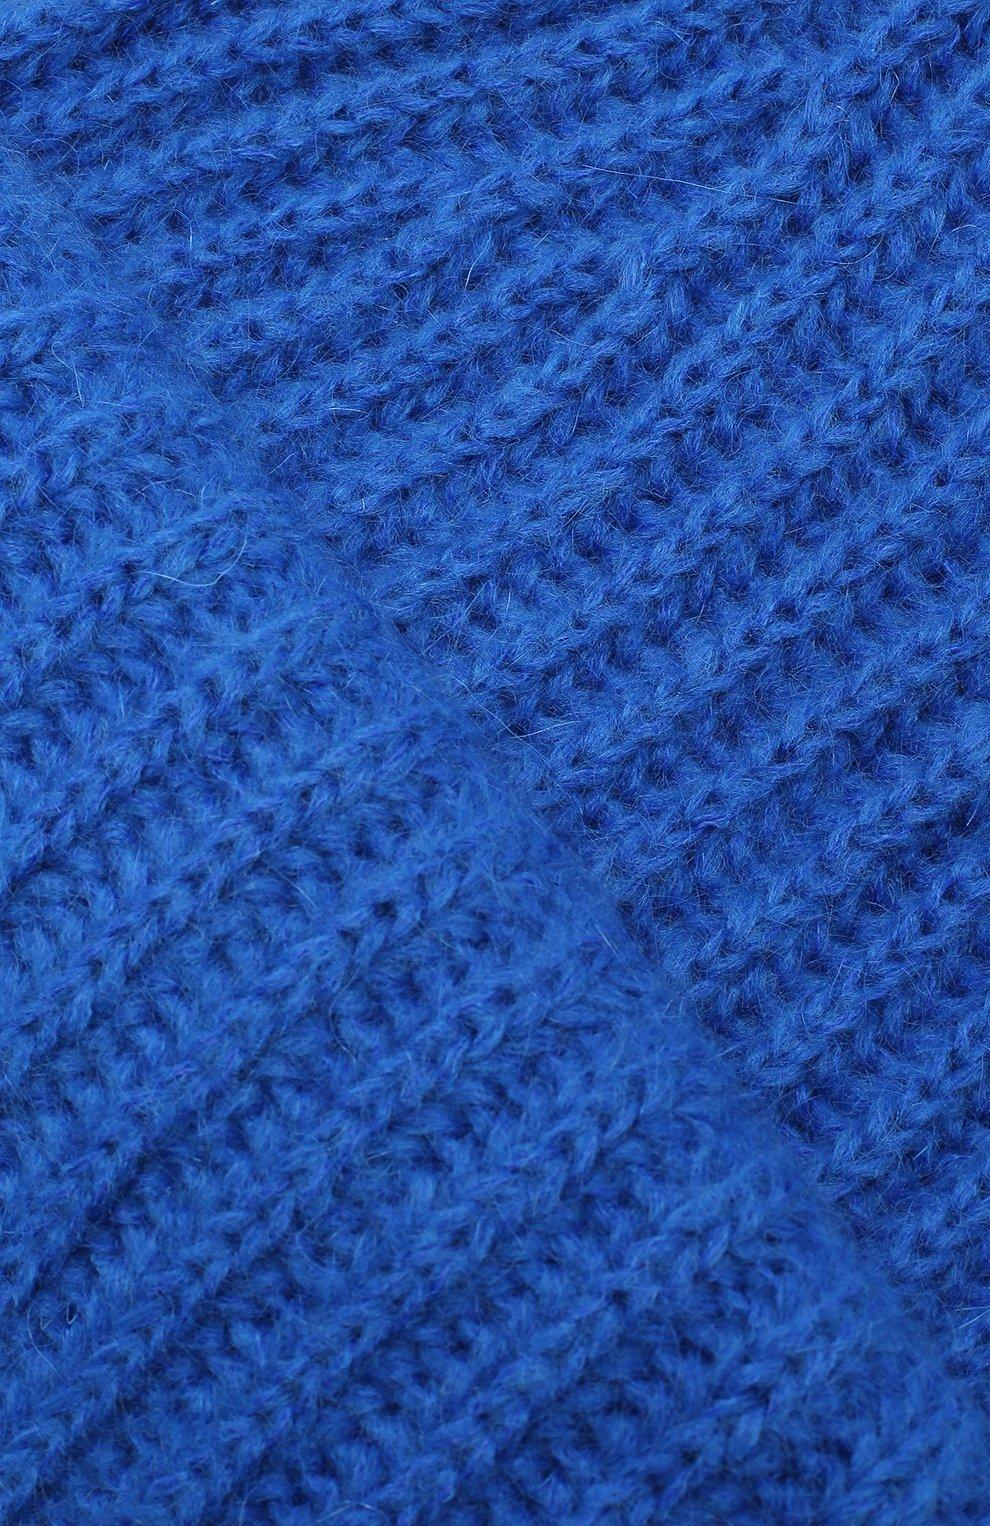 Женская шапка TAK.ORI синего цвета, арт. HTK30043MA030PF18   Фото 3 (Материал: Текстиль, Шерсть, Синтетический материал; Статус проверки: Проверено, Проверена категория)